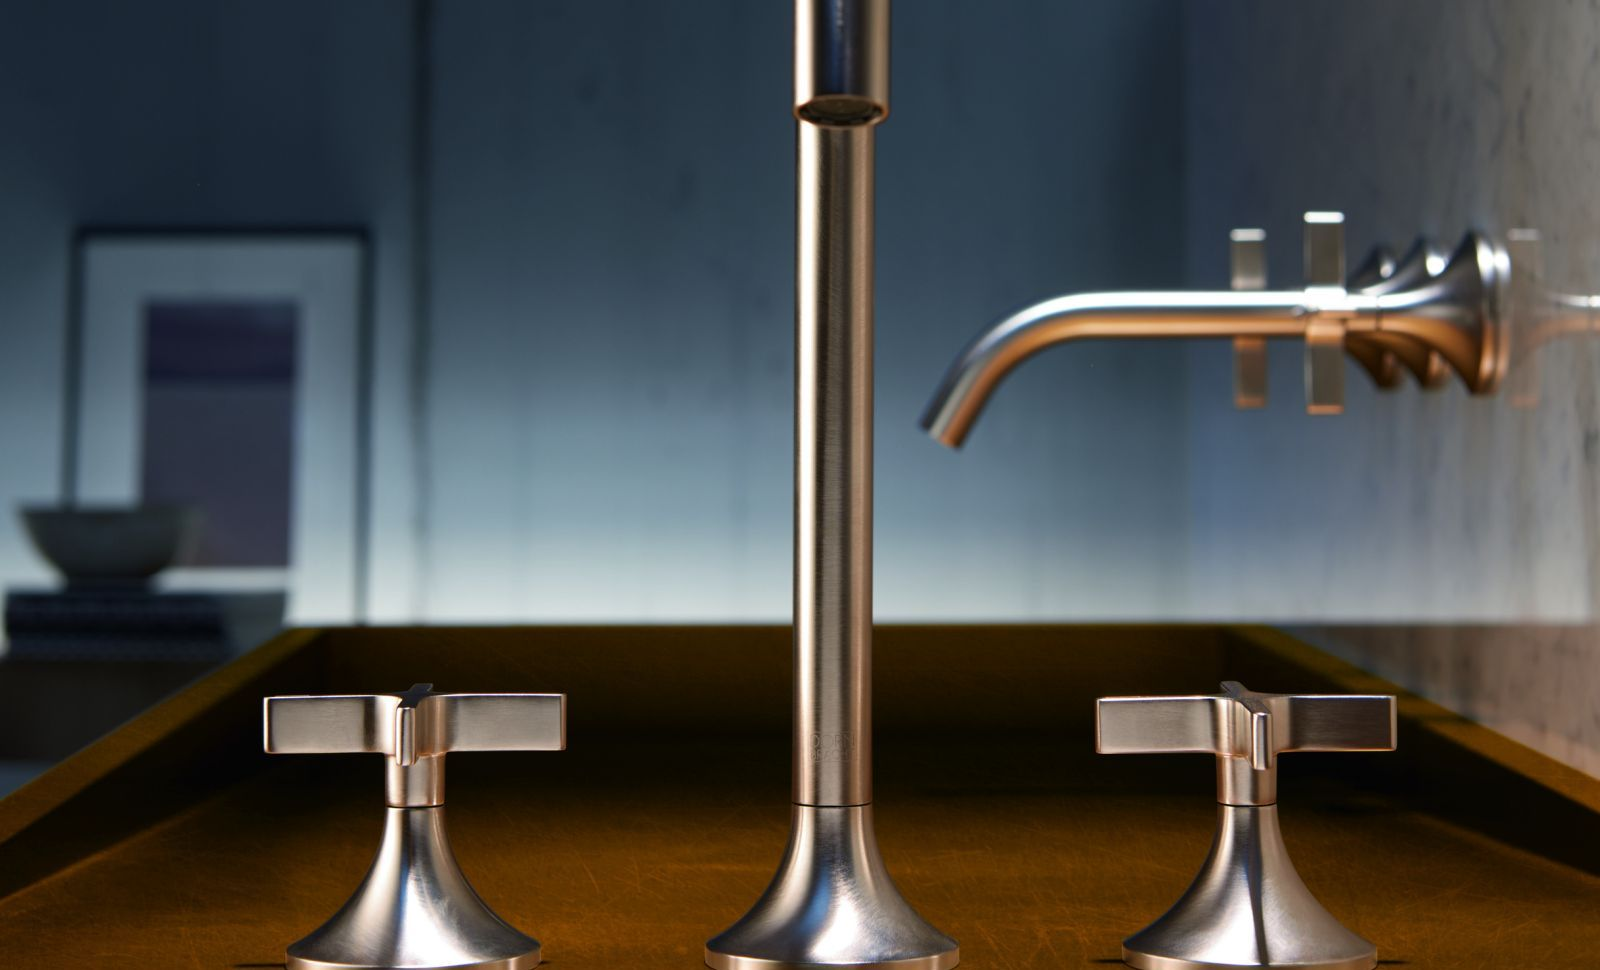 Sanitärgriffe aus verchromtem Zinkdruckguss